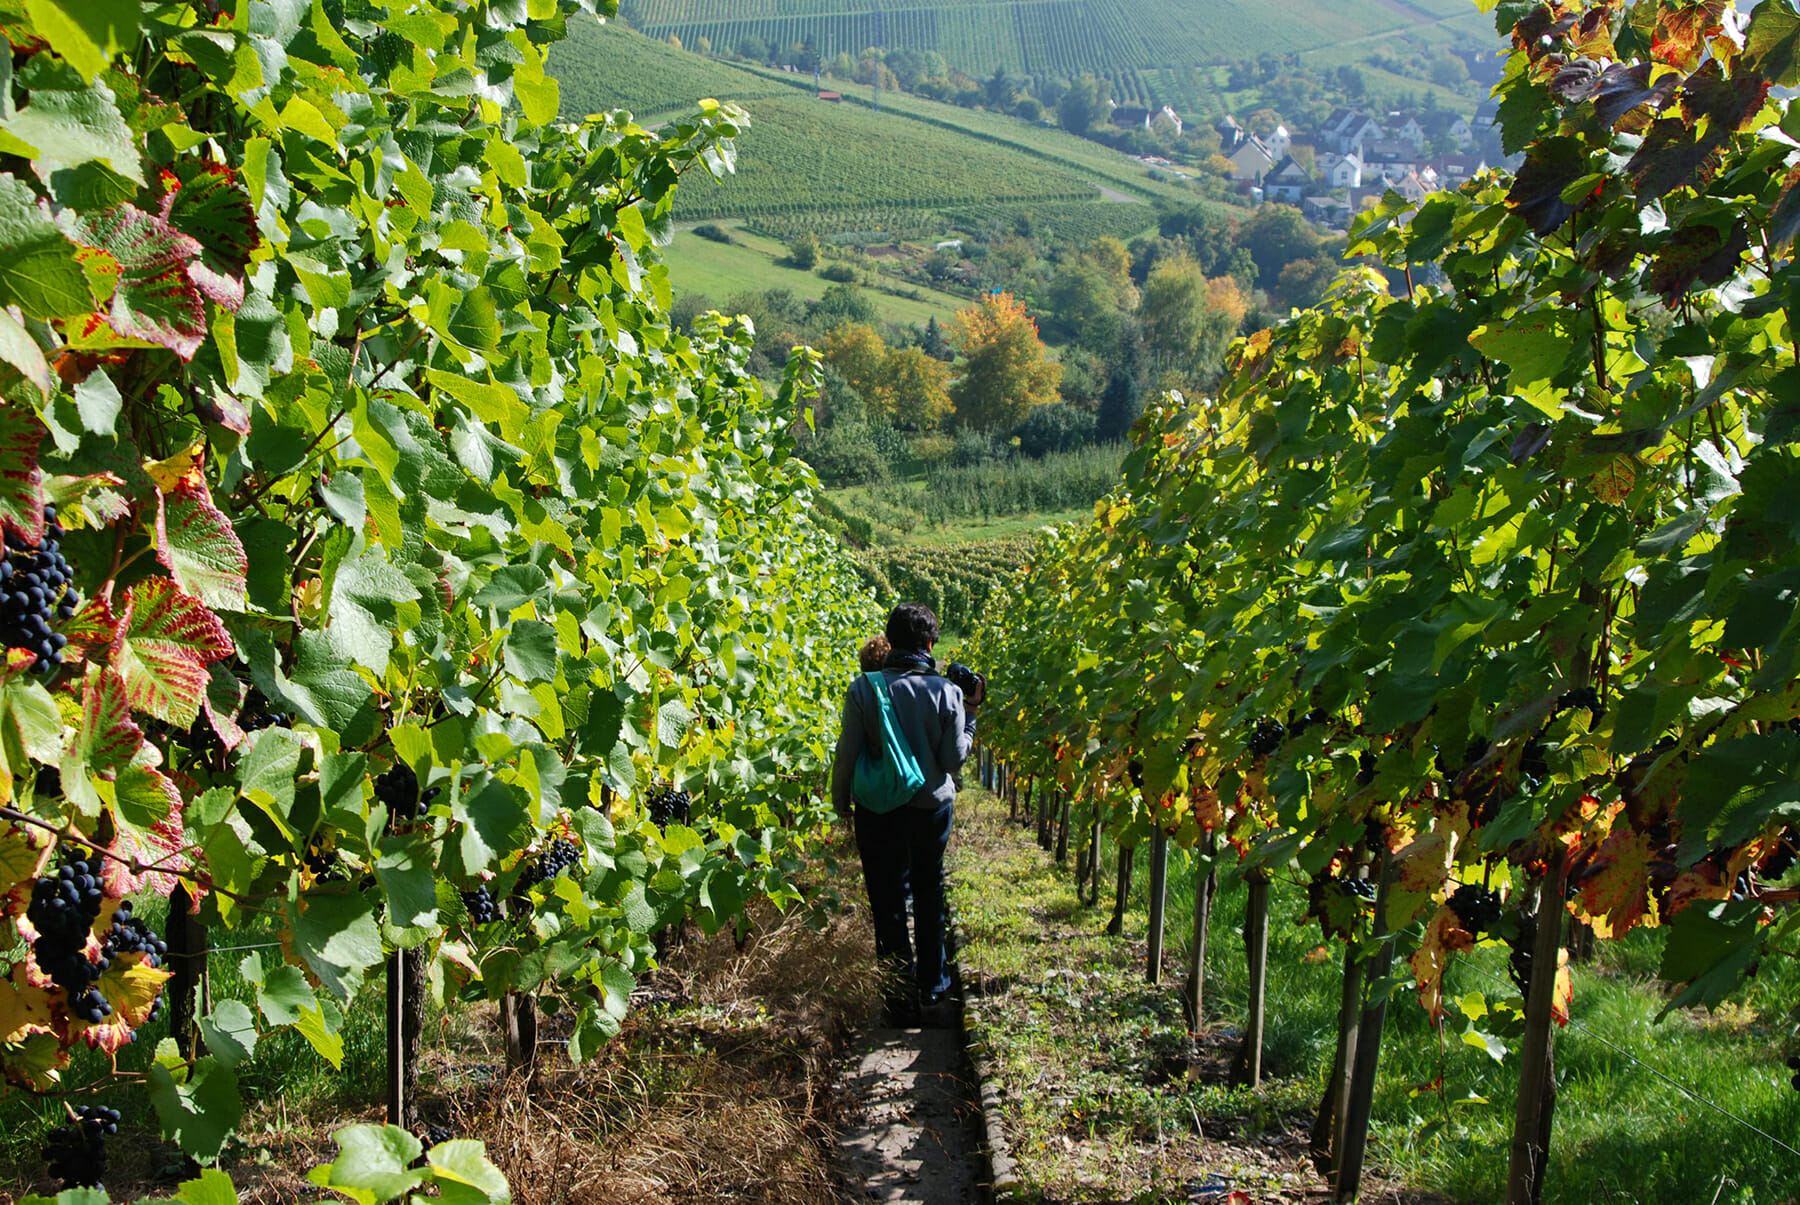 Jordan Winery Summer Vineyard Hike | Best Hiking Sonoma |Hiking Wine